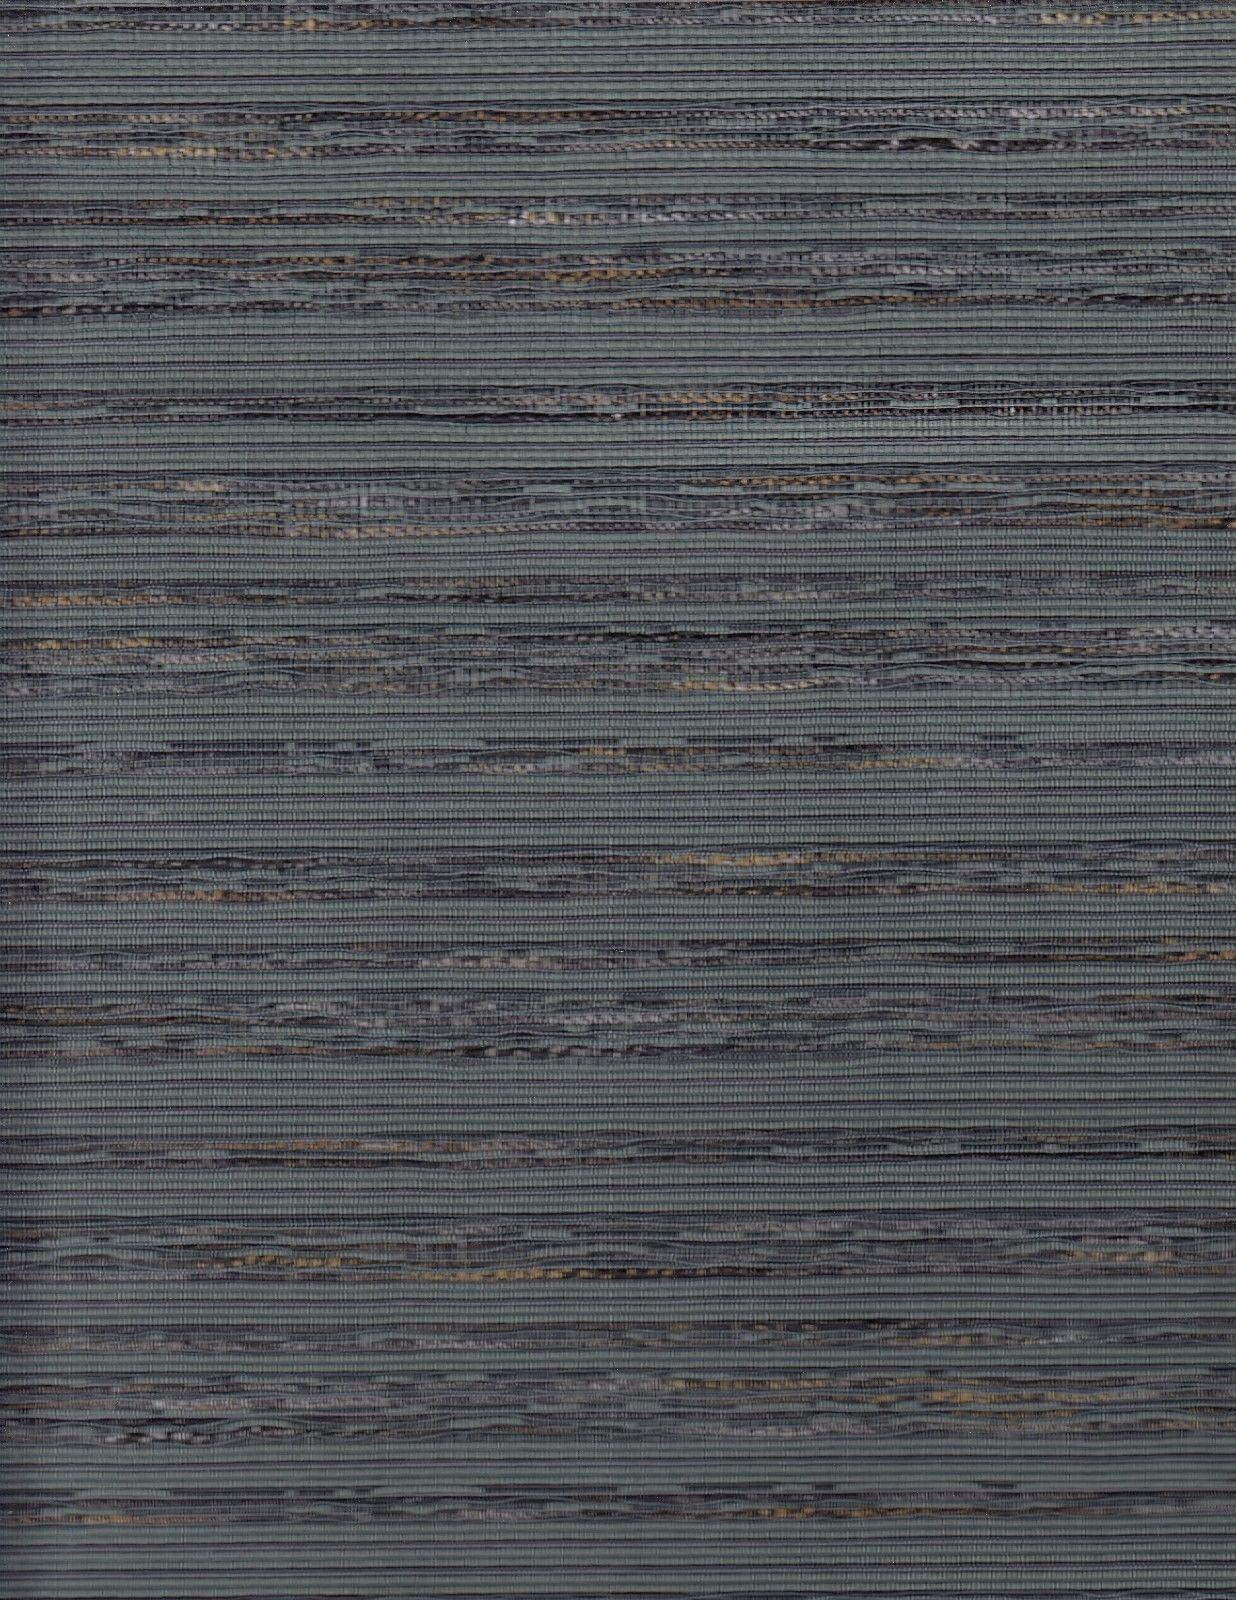 14yds Mid Century Modern Upholstery Fabric Ad Men Tweed Stripe Lake Blue ED1-c14